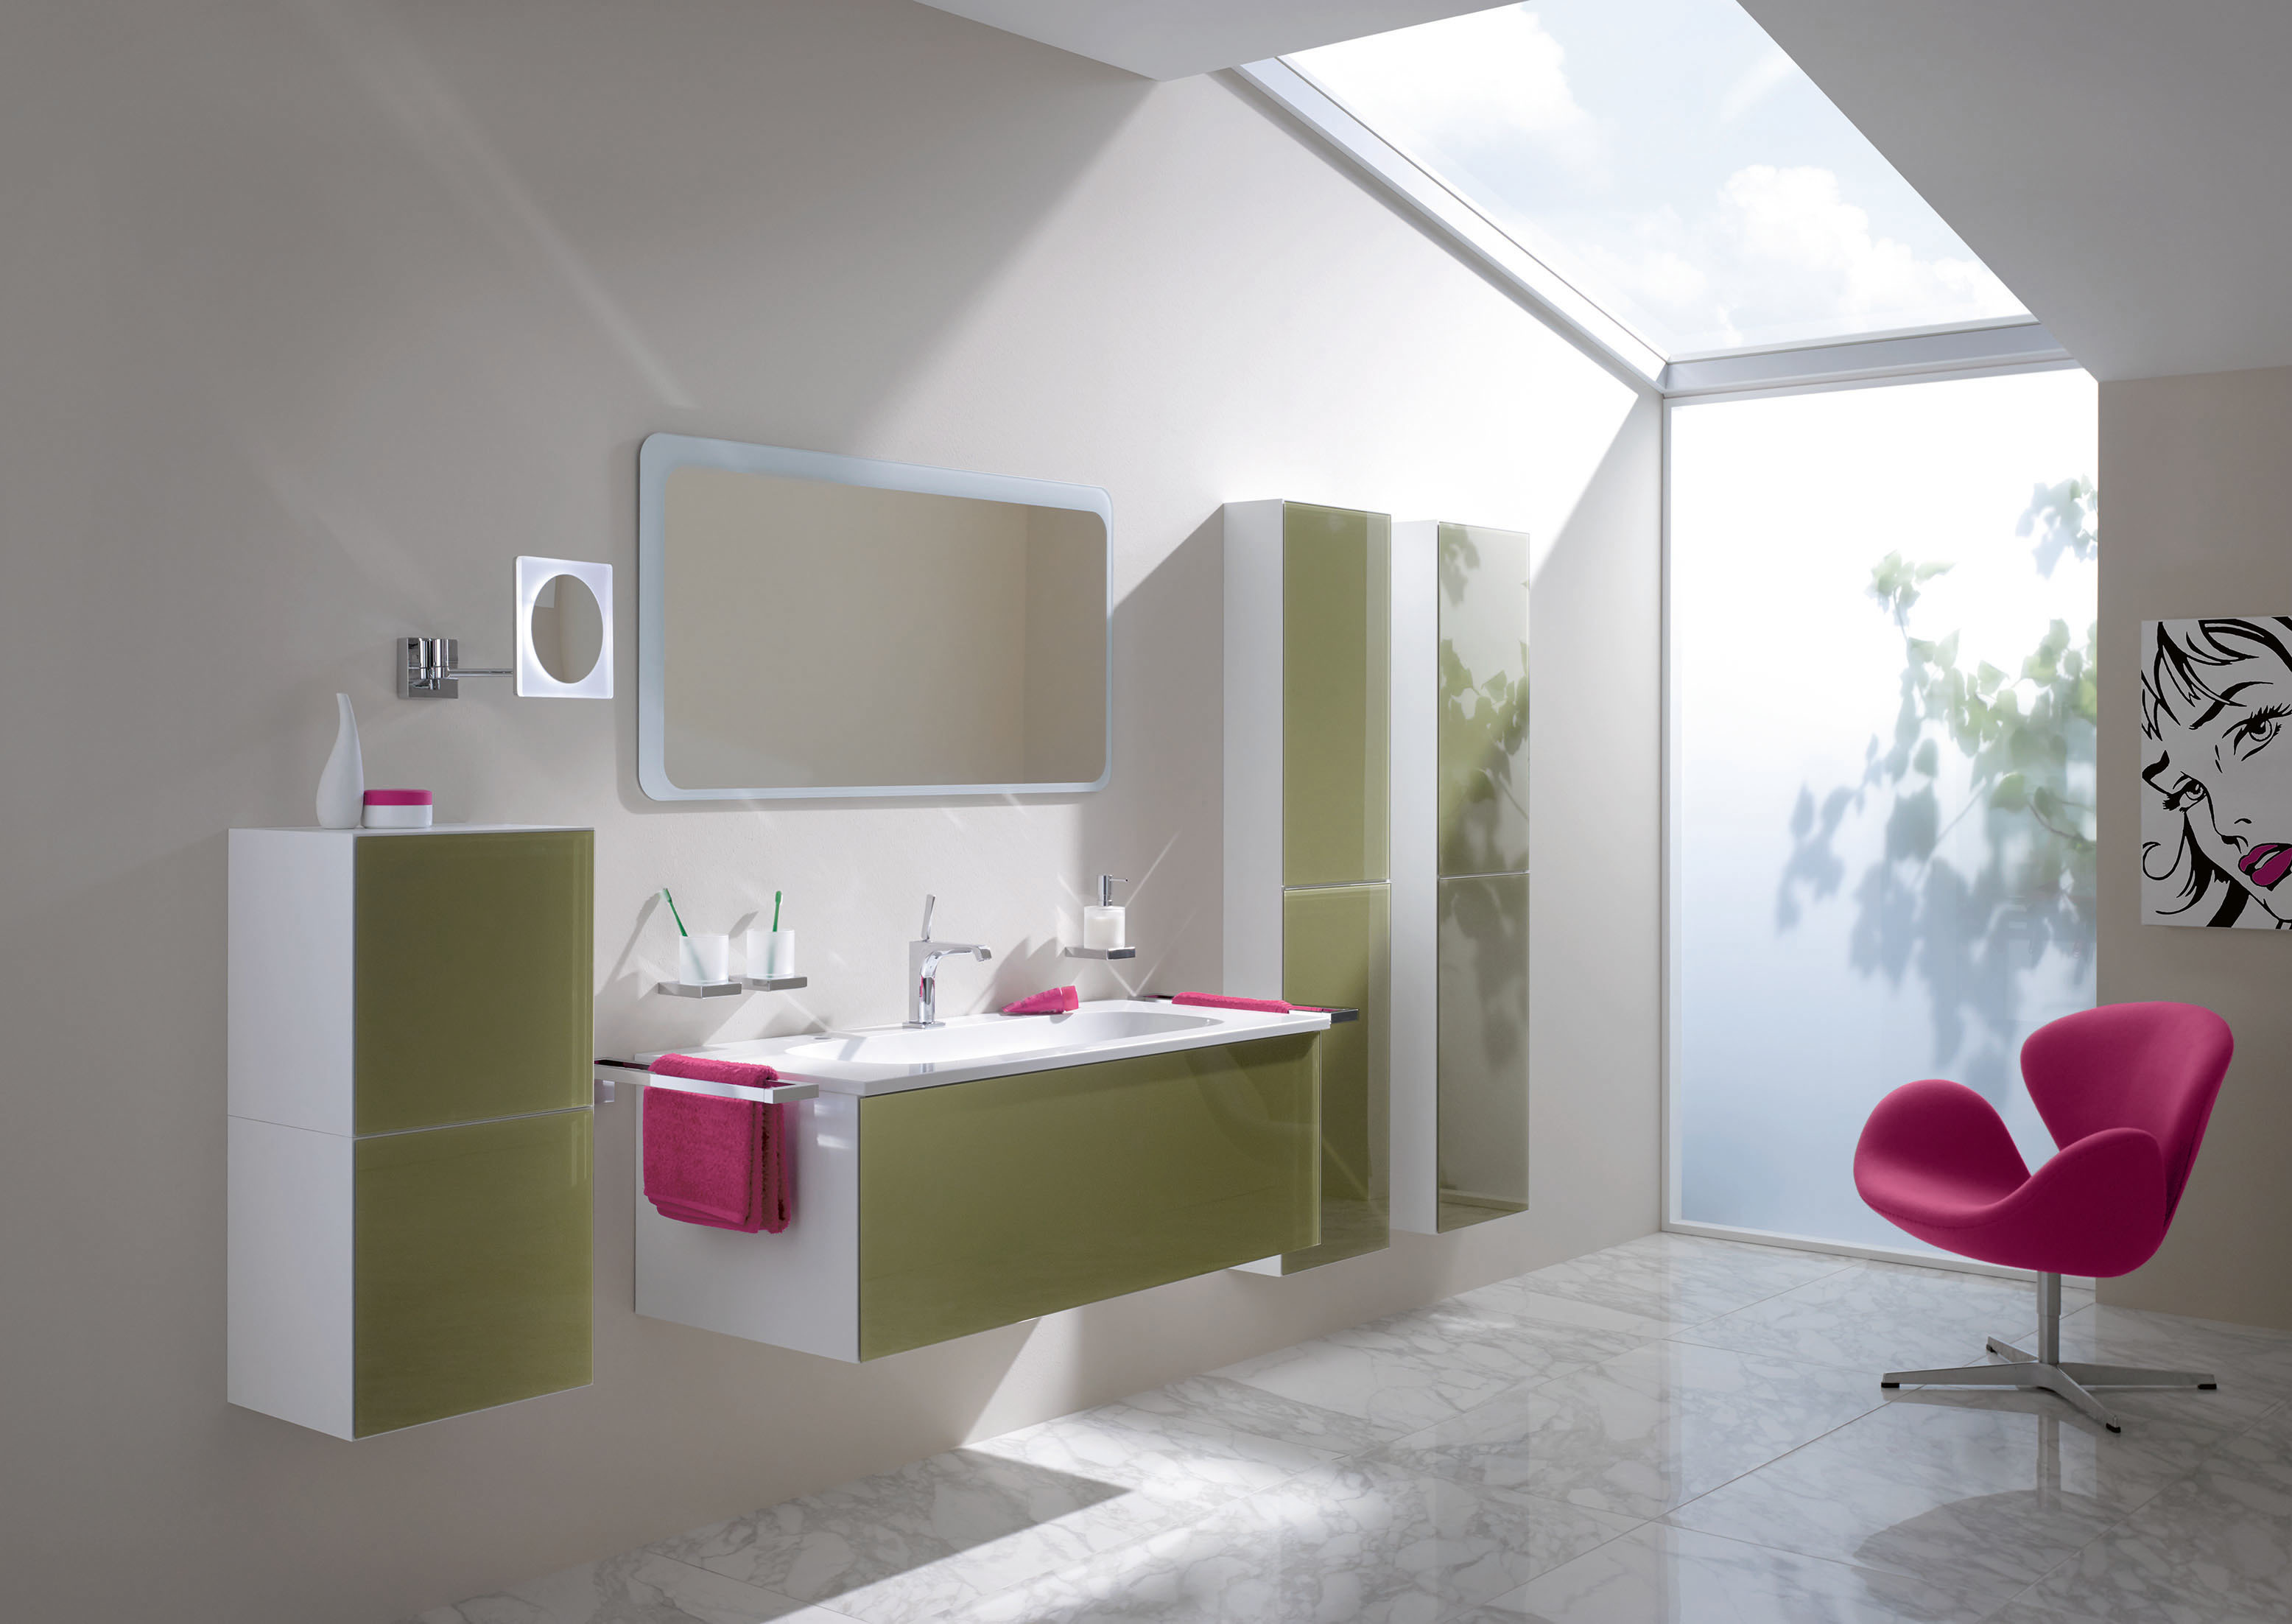 schrank modul 120 30 anschlag rechts glasfront aqua von hewi stylepark. Black Bedroom Furniture Sets. Home Design Ideas